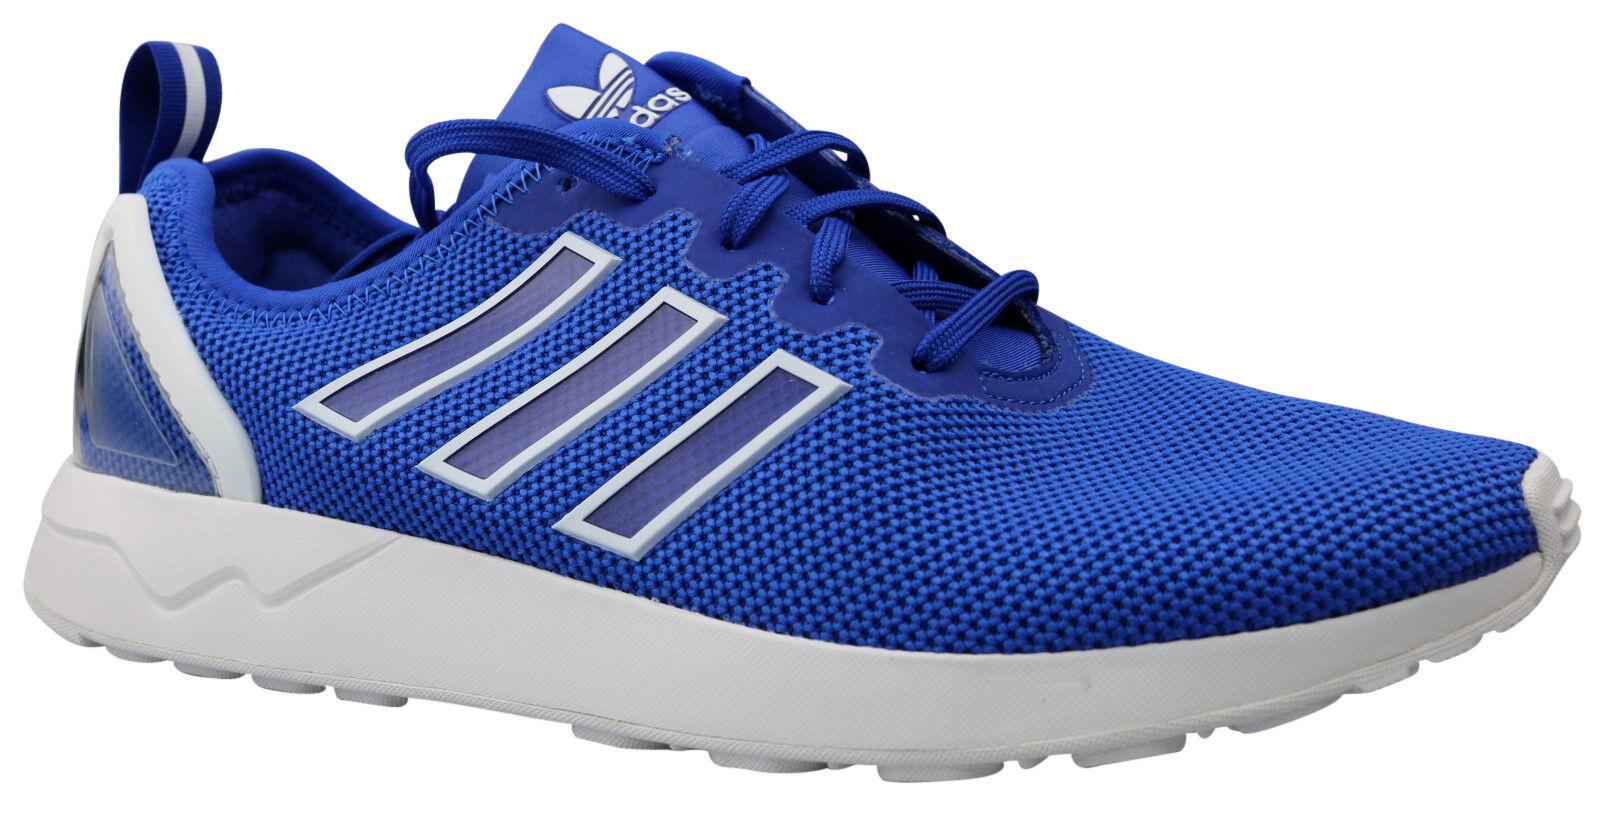 Adidas Originals s79007 ZX Flux ADV unisex cortos zapatos s79007 Originals nuevo embalaje original df3330